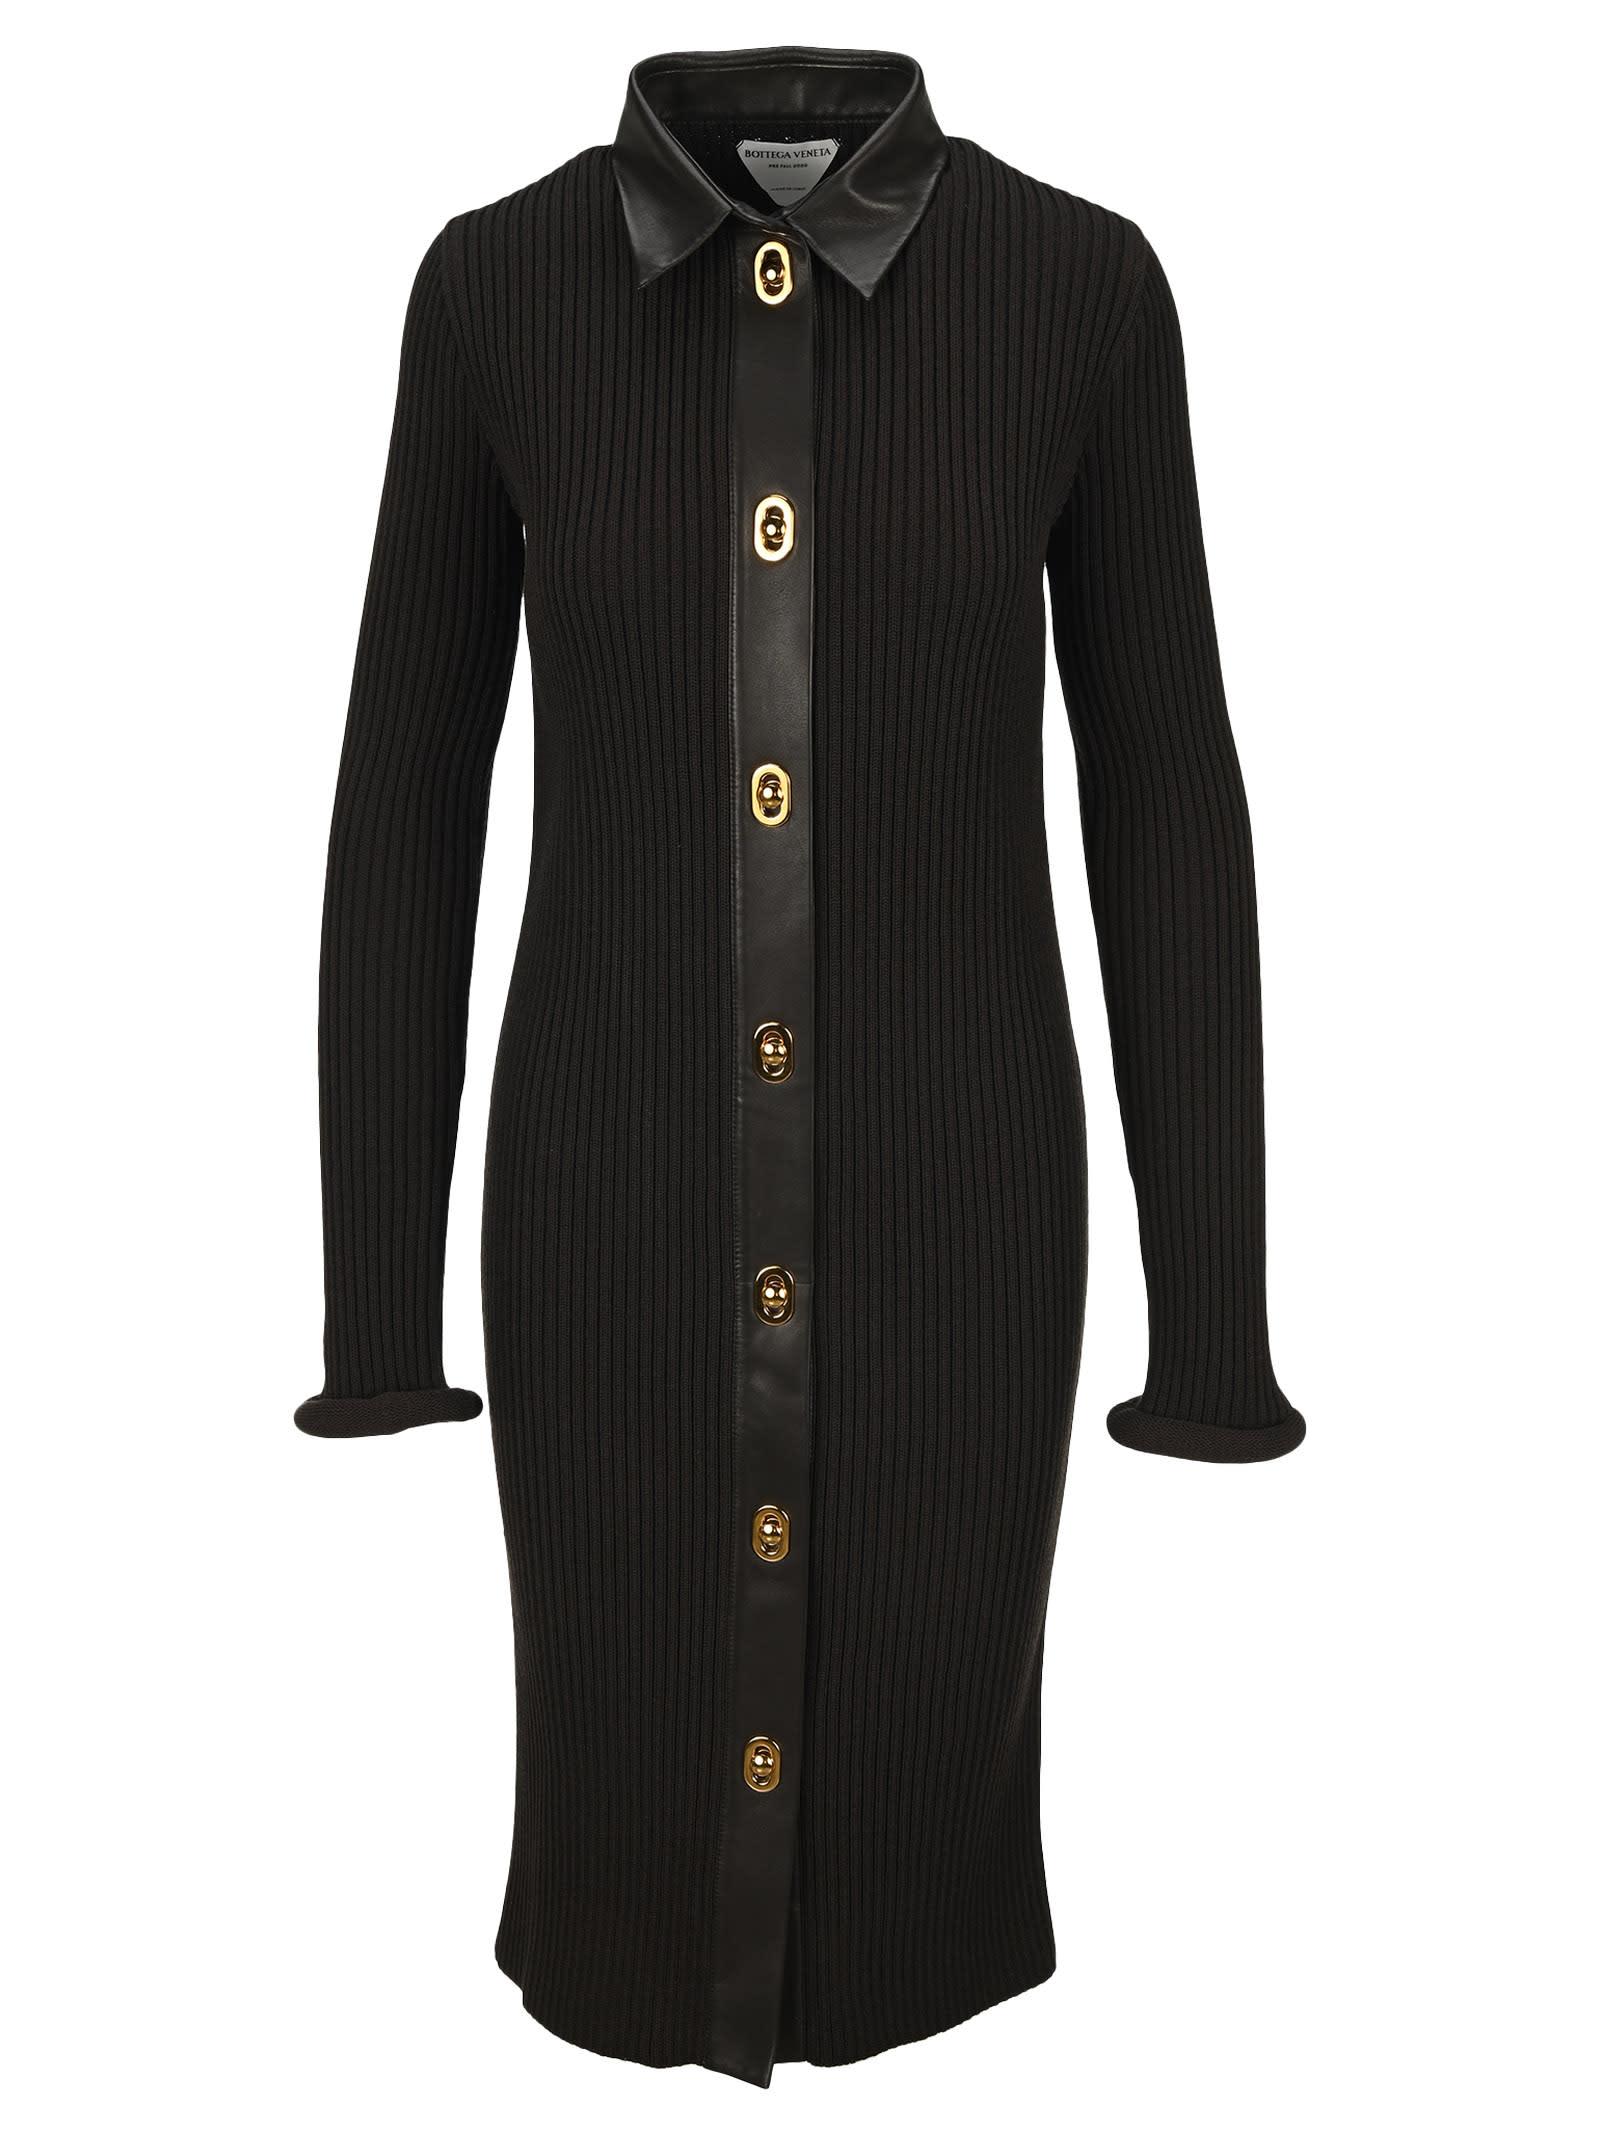 Buy Bottega Veneta Knitted Dress online, shop Bottega Veneta with free shipping